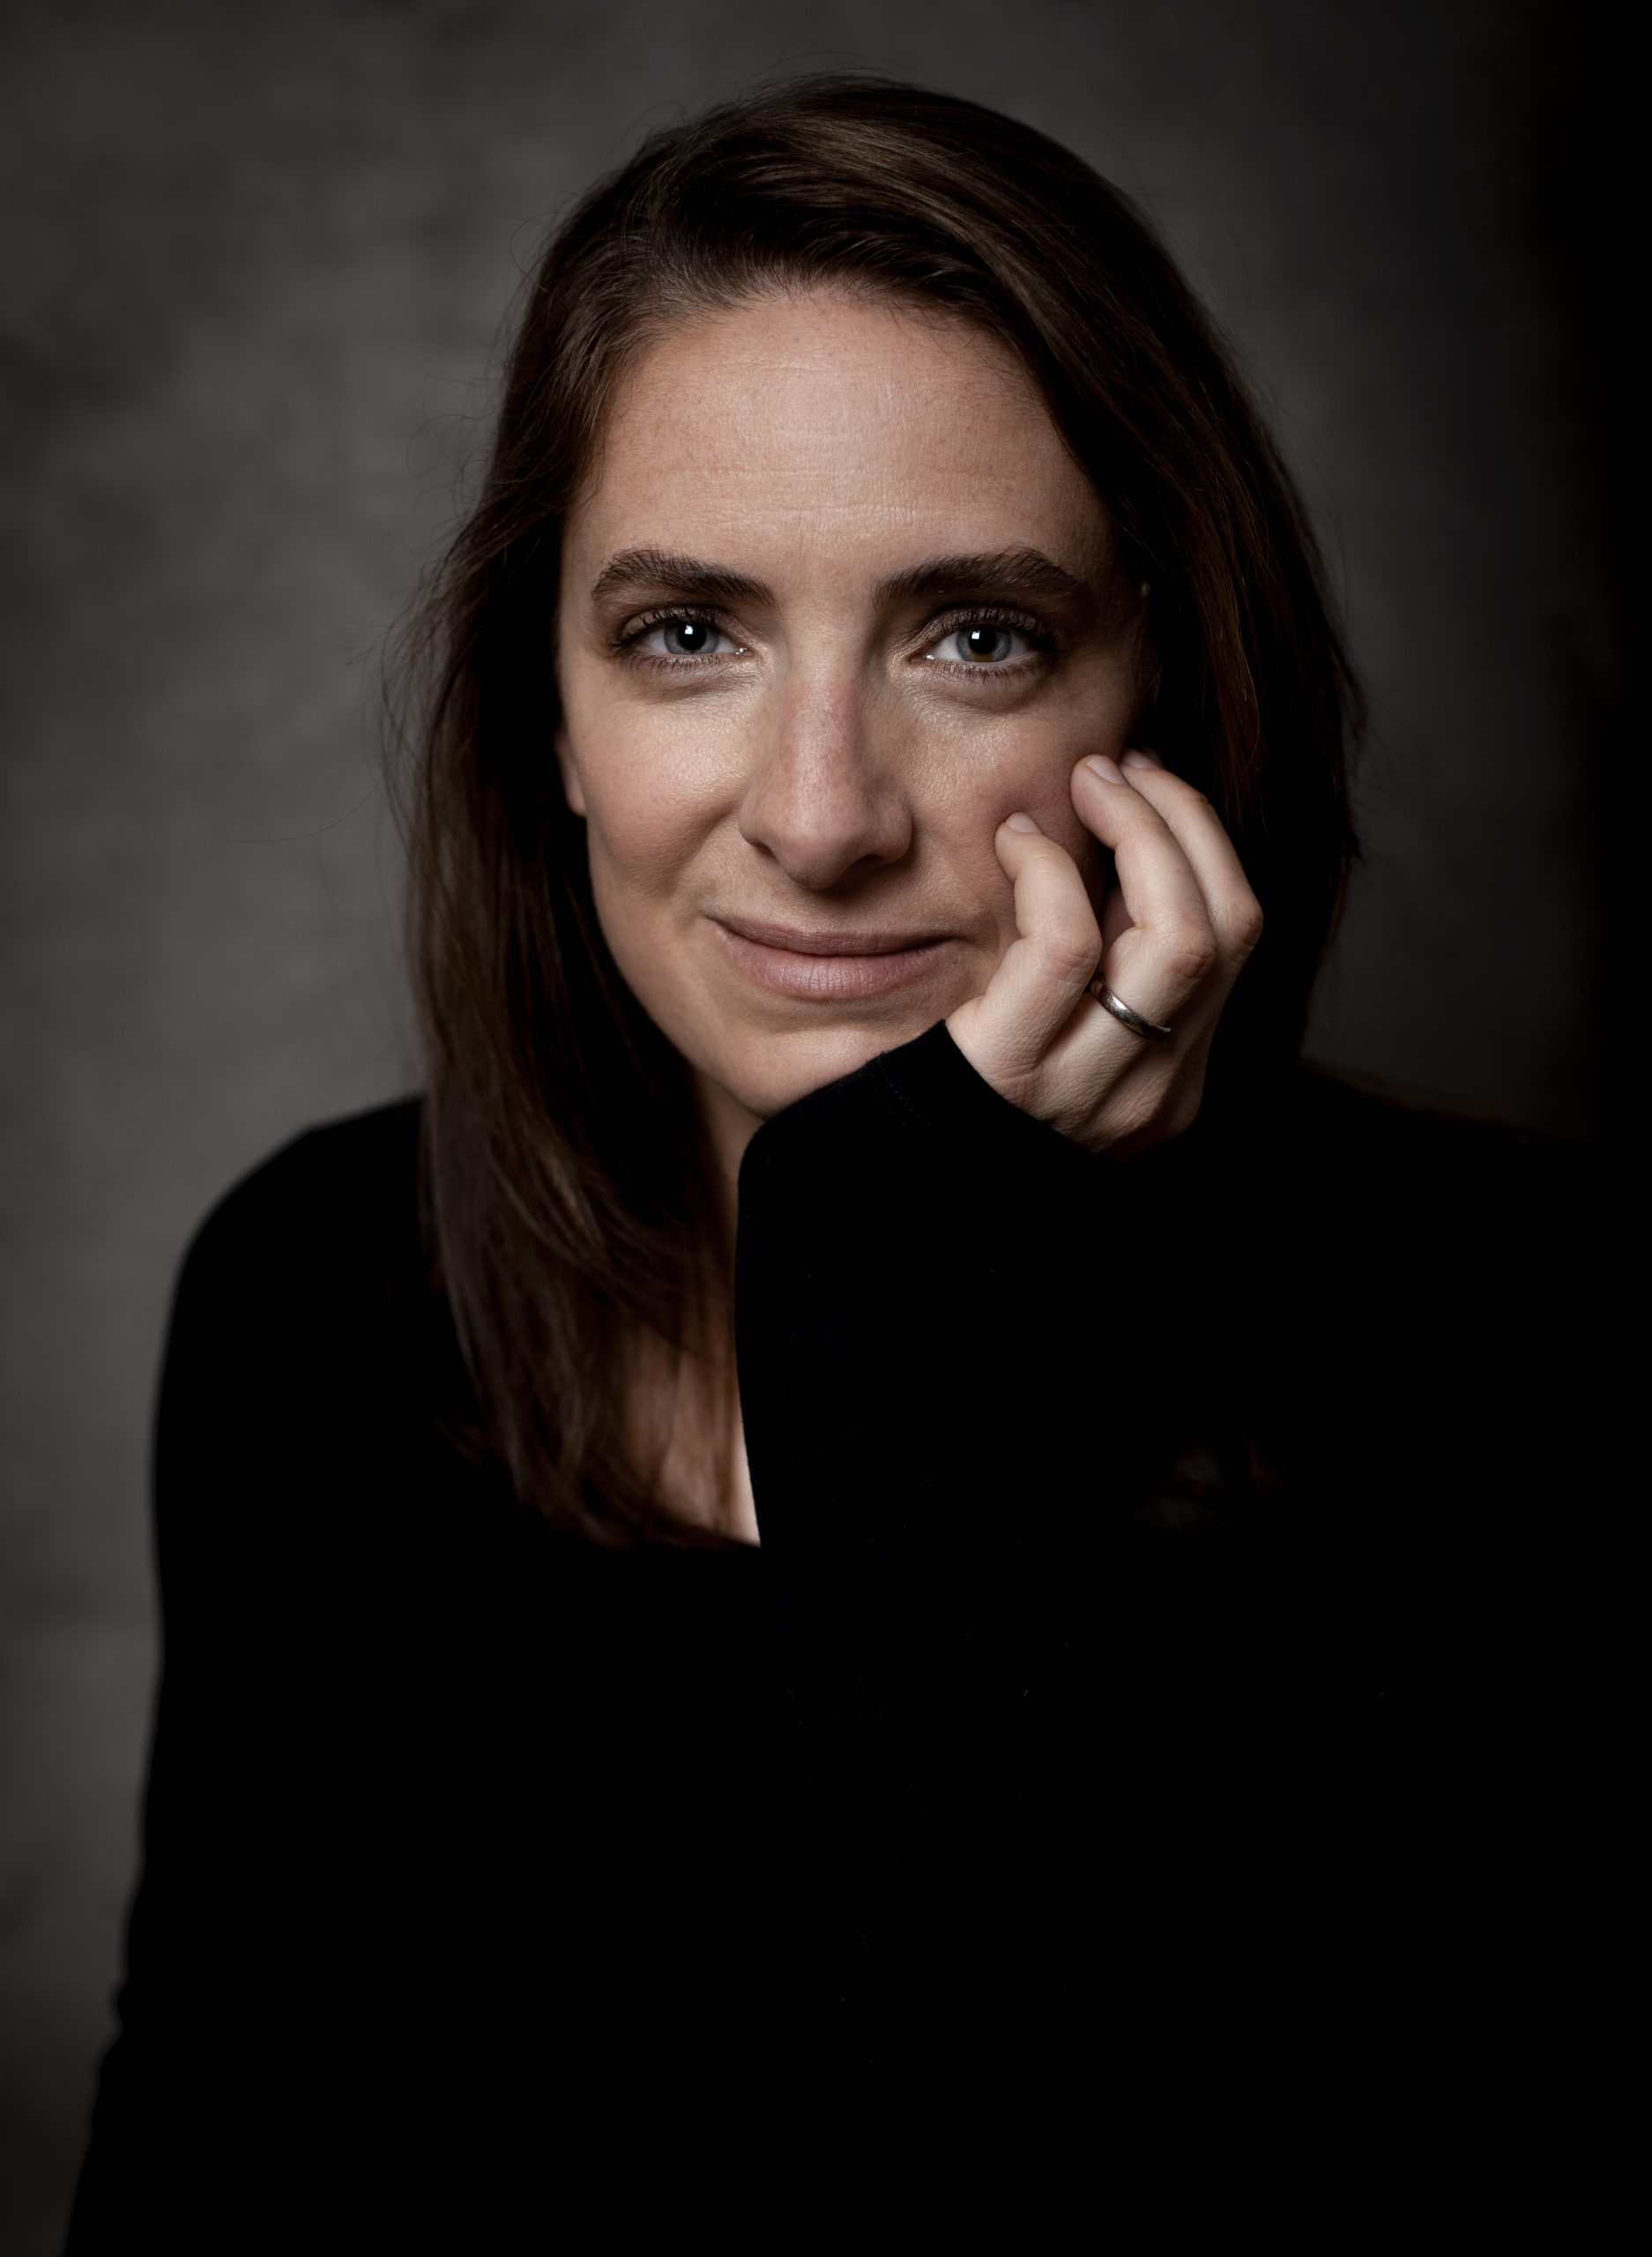 Miriam Bunnik